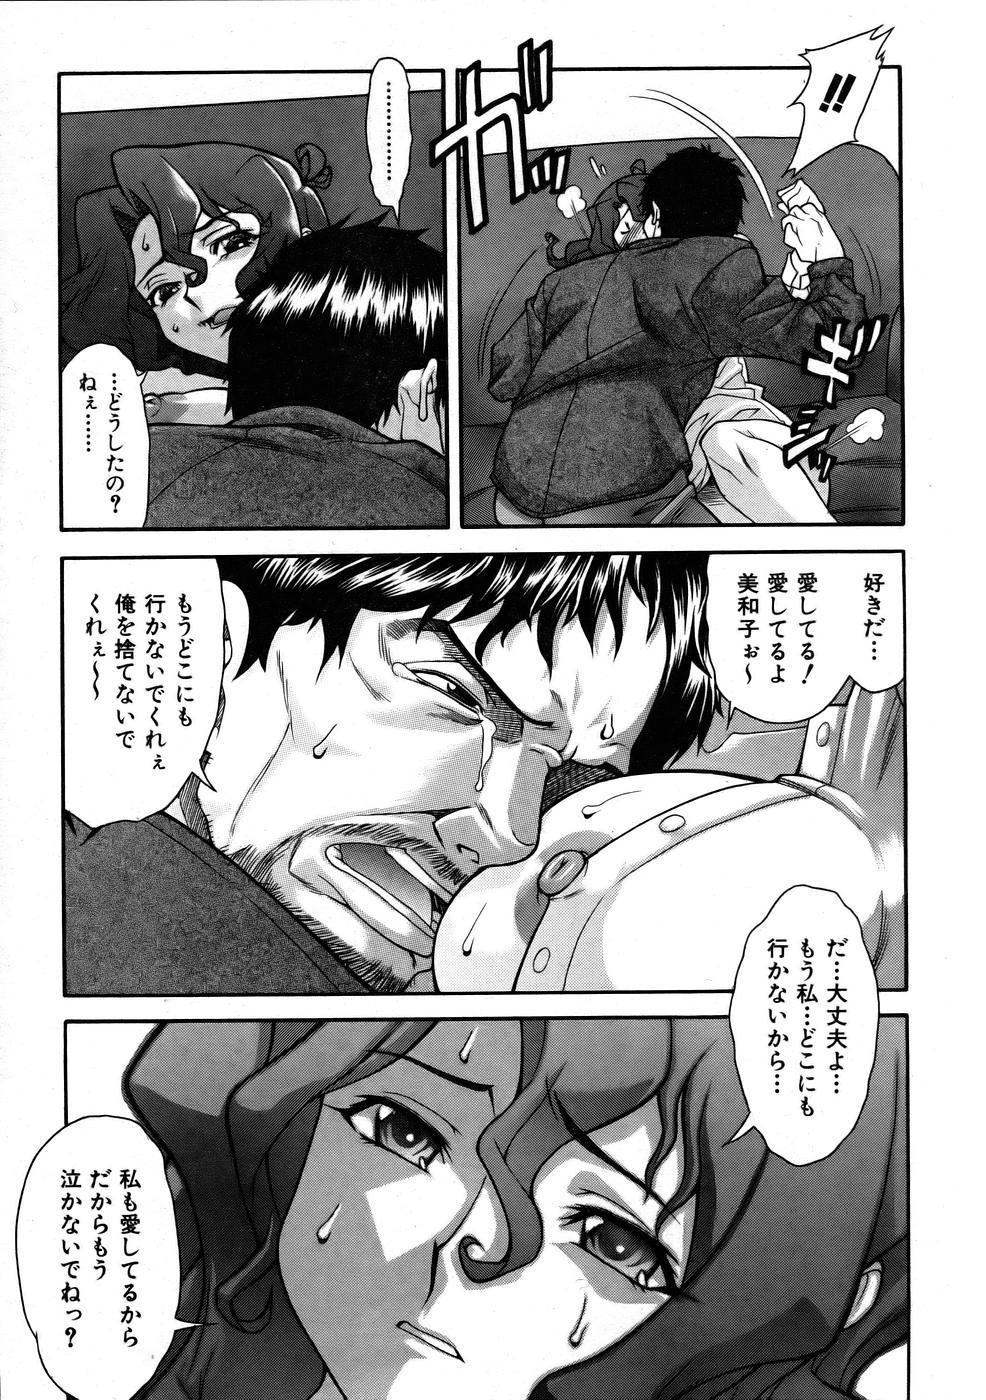 COMIC AUN 2005-10 Vol. 113 142